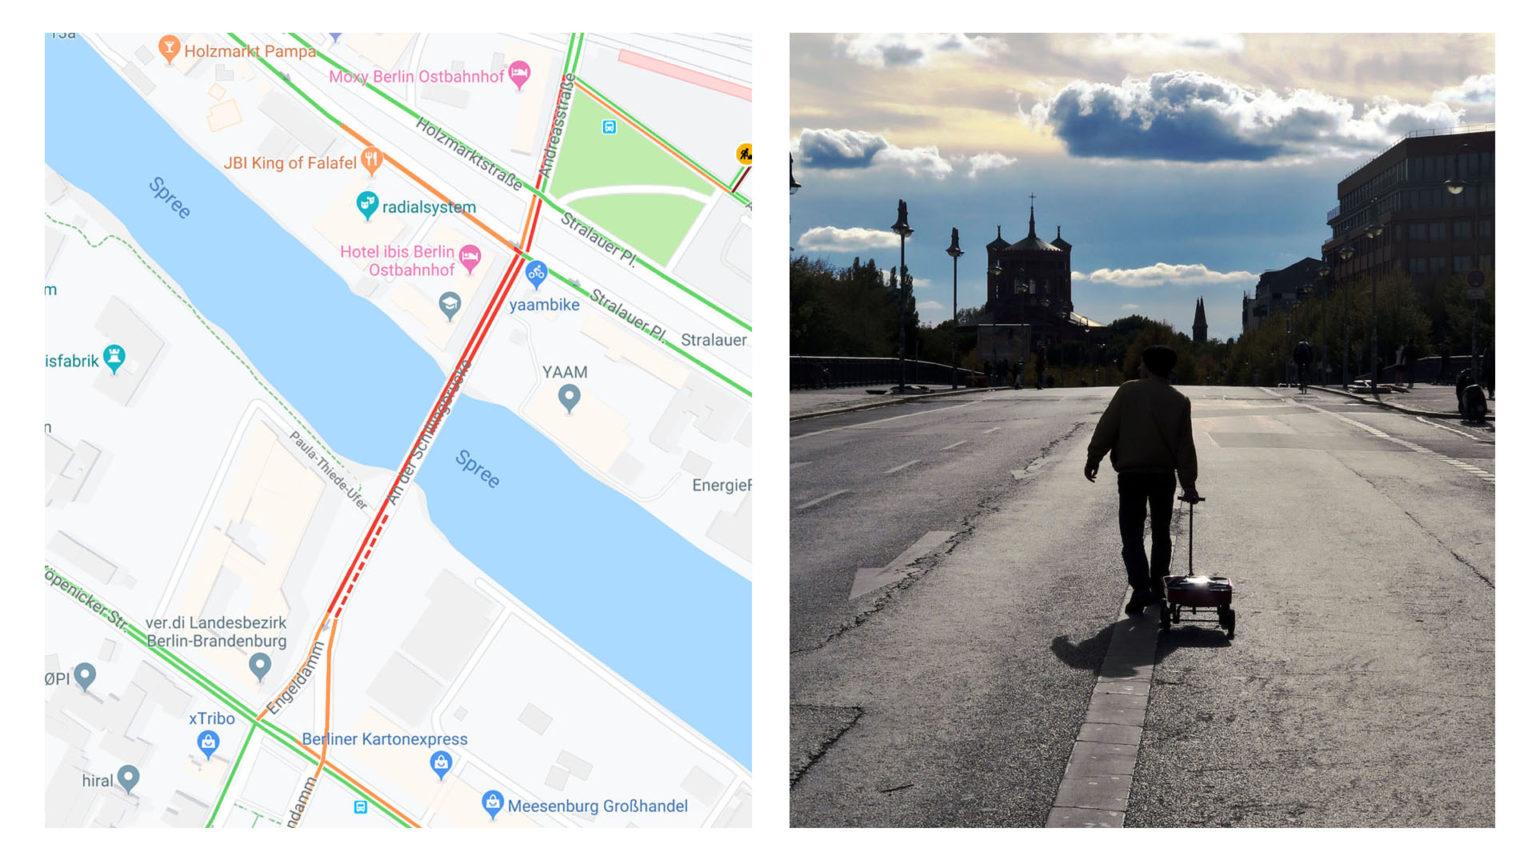 Google Maps: Virtual Traffic Jam